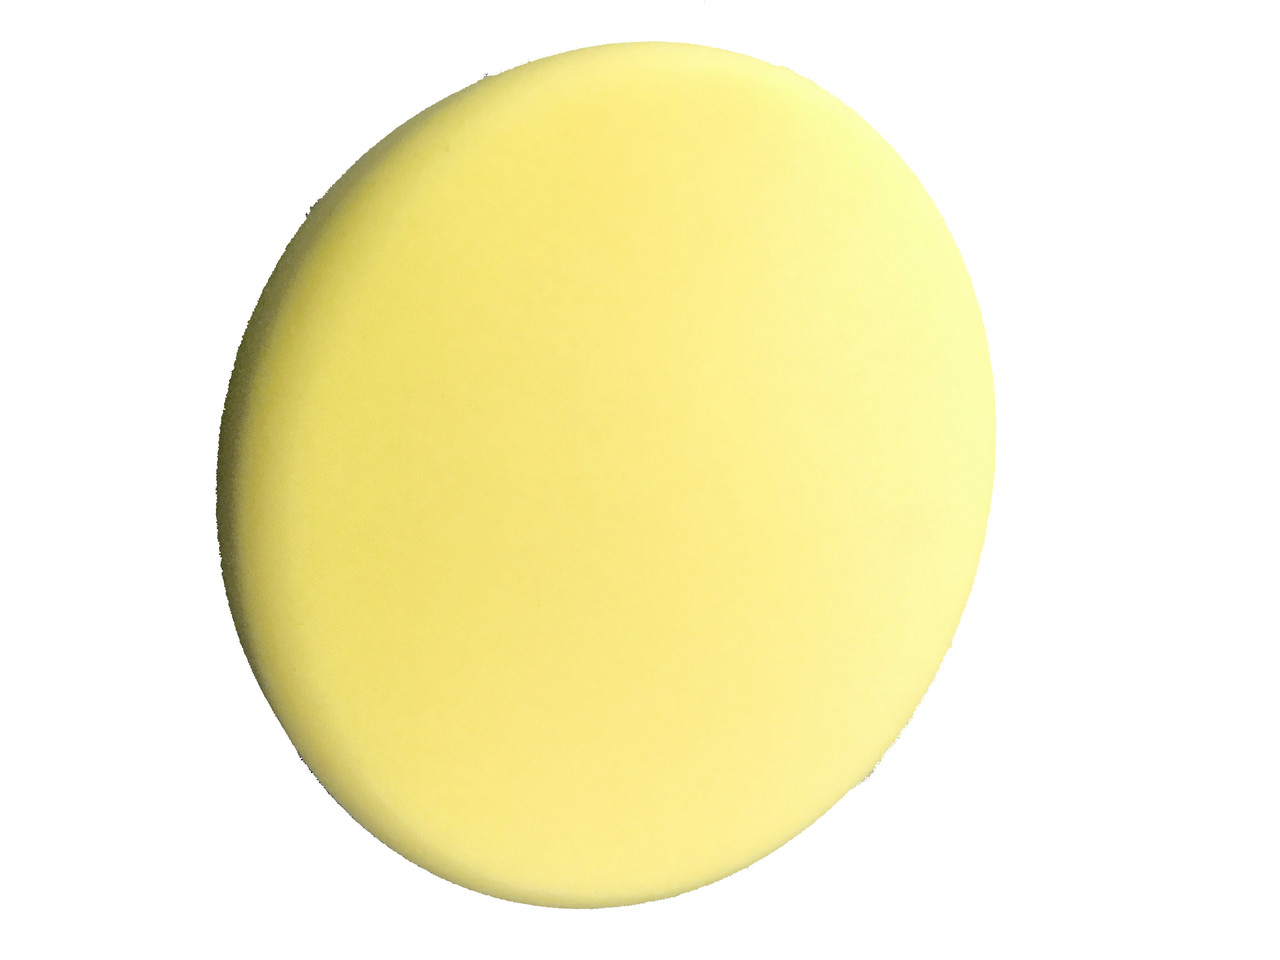 Полировальный круг полу-твердый - Koch Chemie 160х30 мм. желтый (999044)